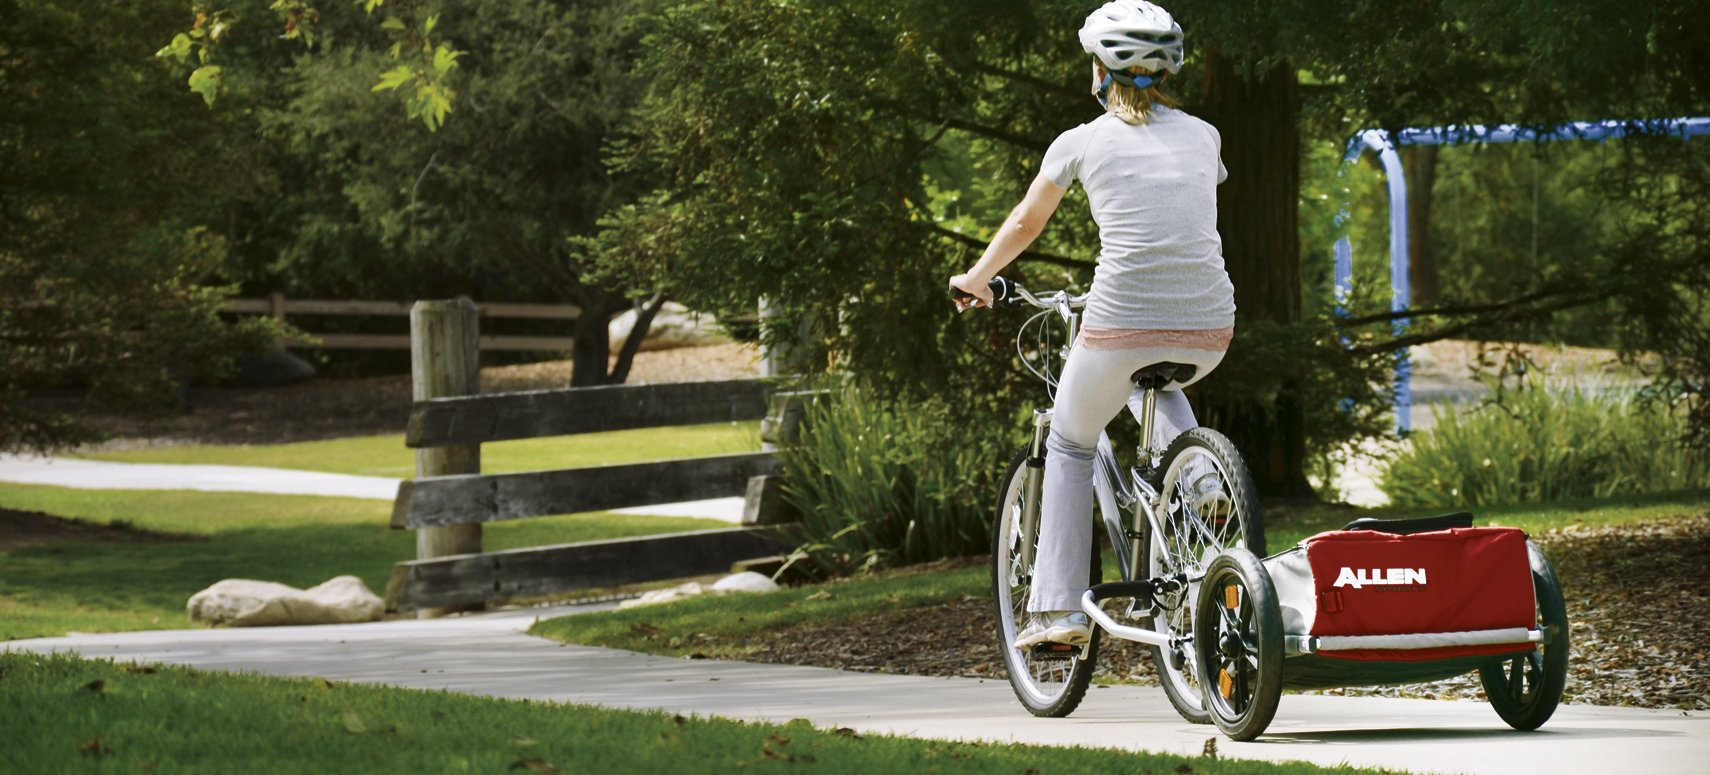 Allen Sports Explorer Bicycle Cargo Trailer by Allen Sports (Image #2)